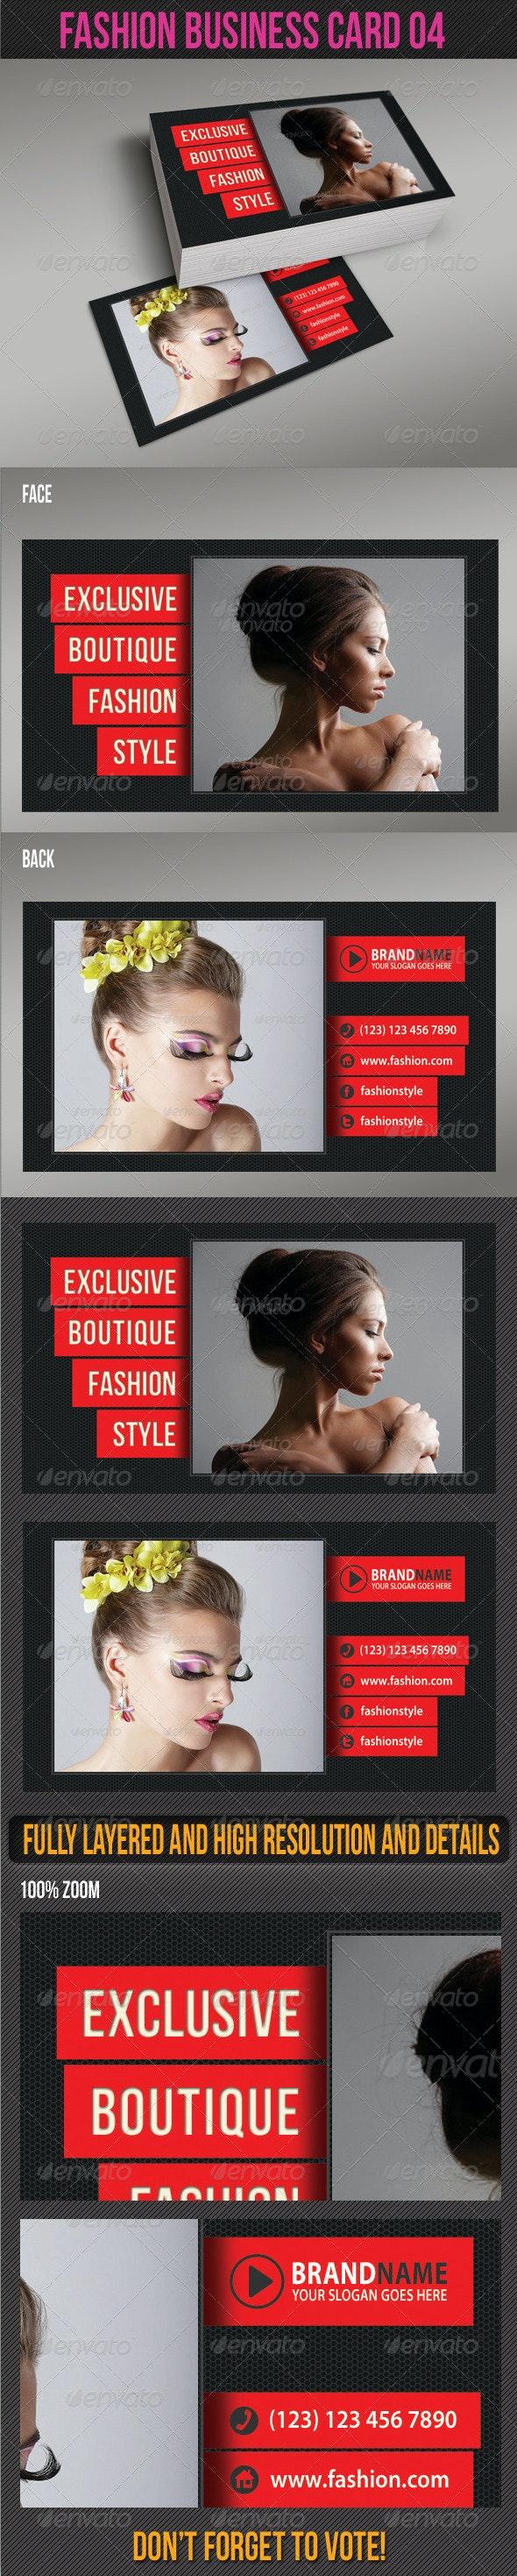 Fashion Business Card 04 - Creative Business Cards